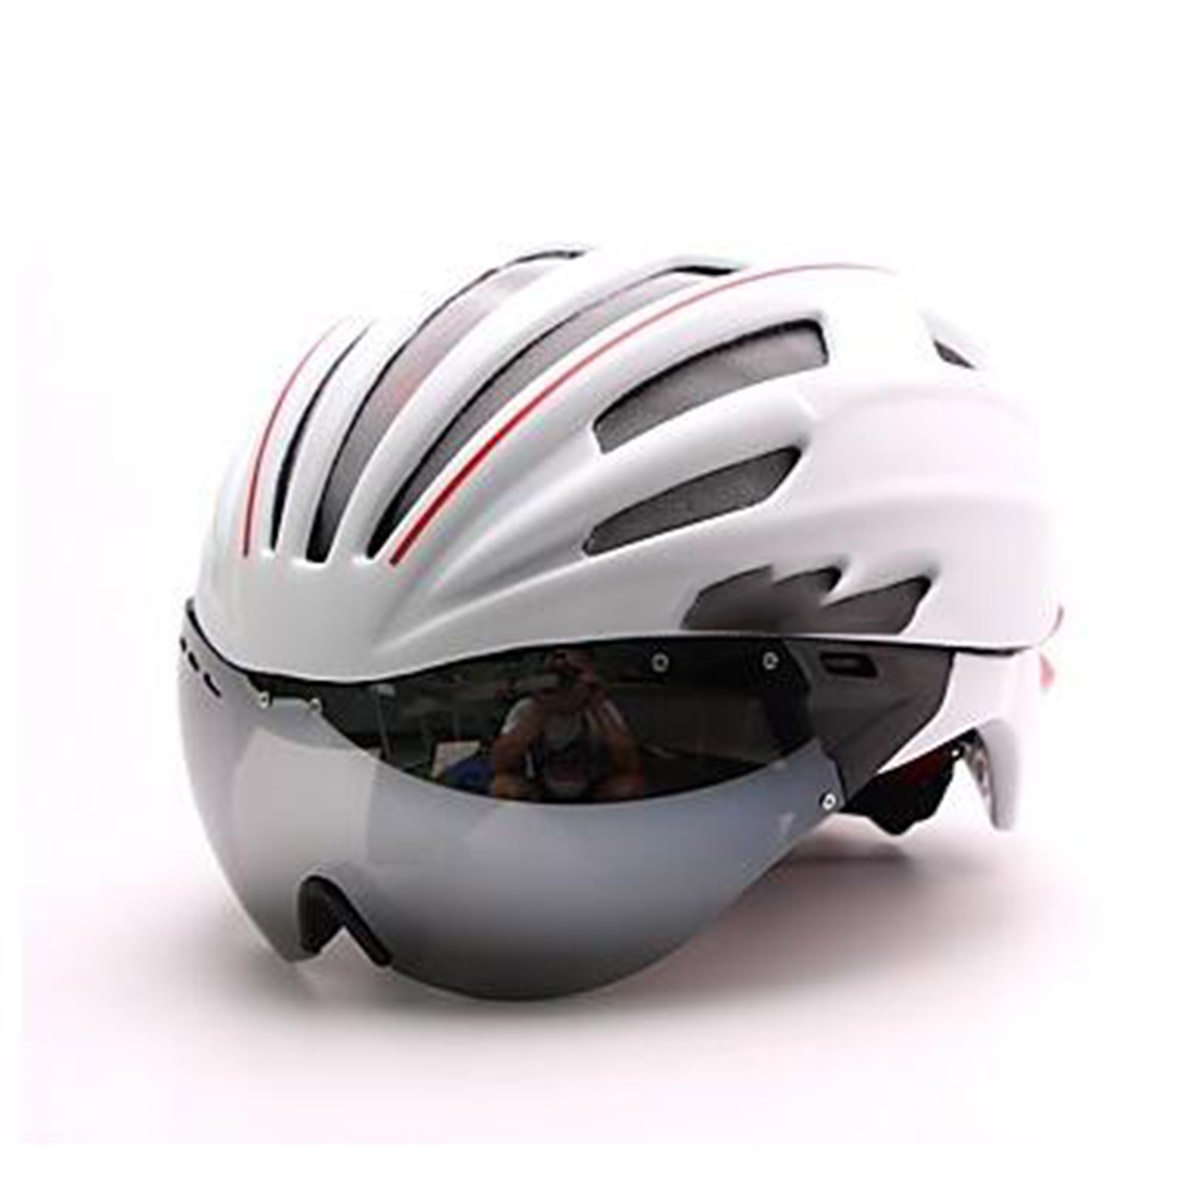 TZQ Unisex Full-Face Bike Helm 28 Vents Radfahren Road Cycling Medium: 54-60cm PC / EPS Weiß / Grün / Rot / Blau